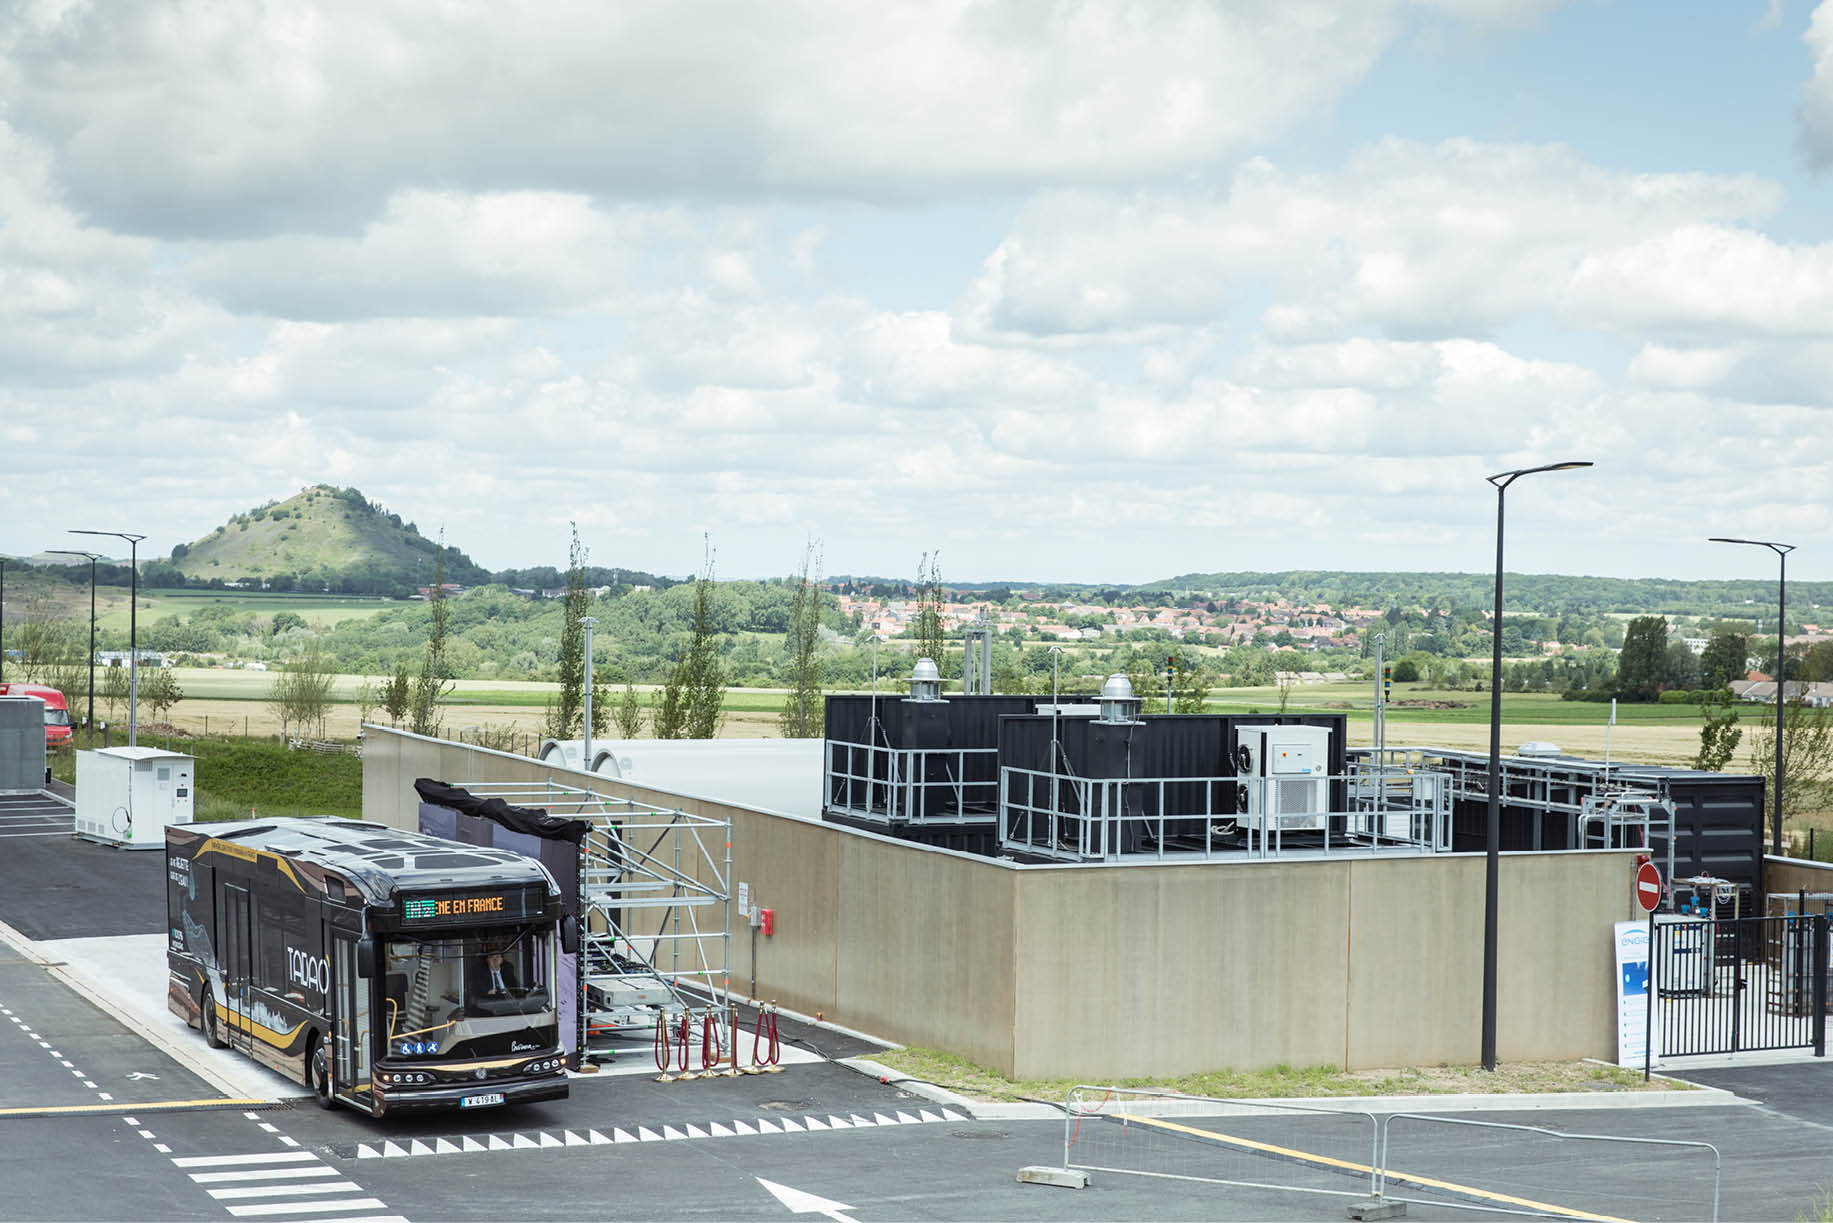 Station hydrogène de Lens, construite par McPhy (McPhy)